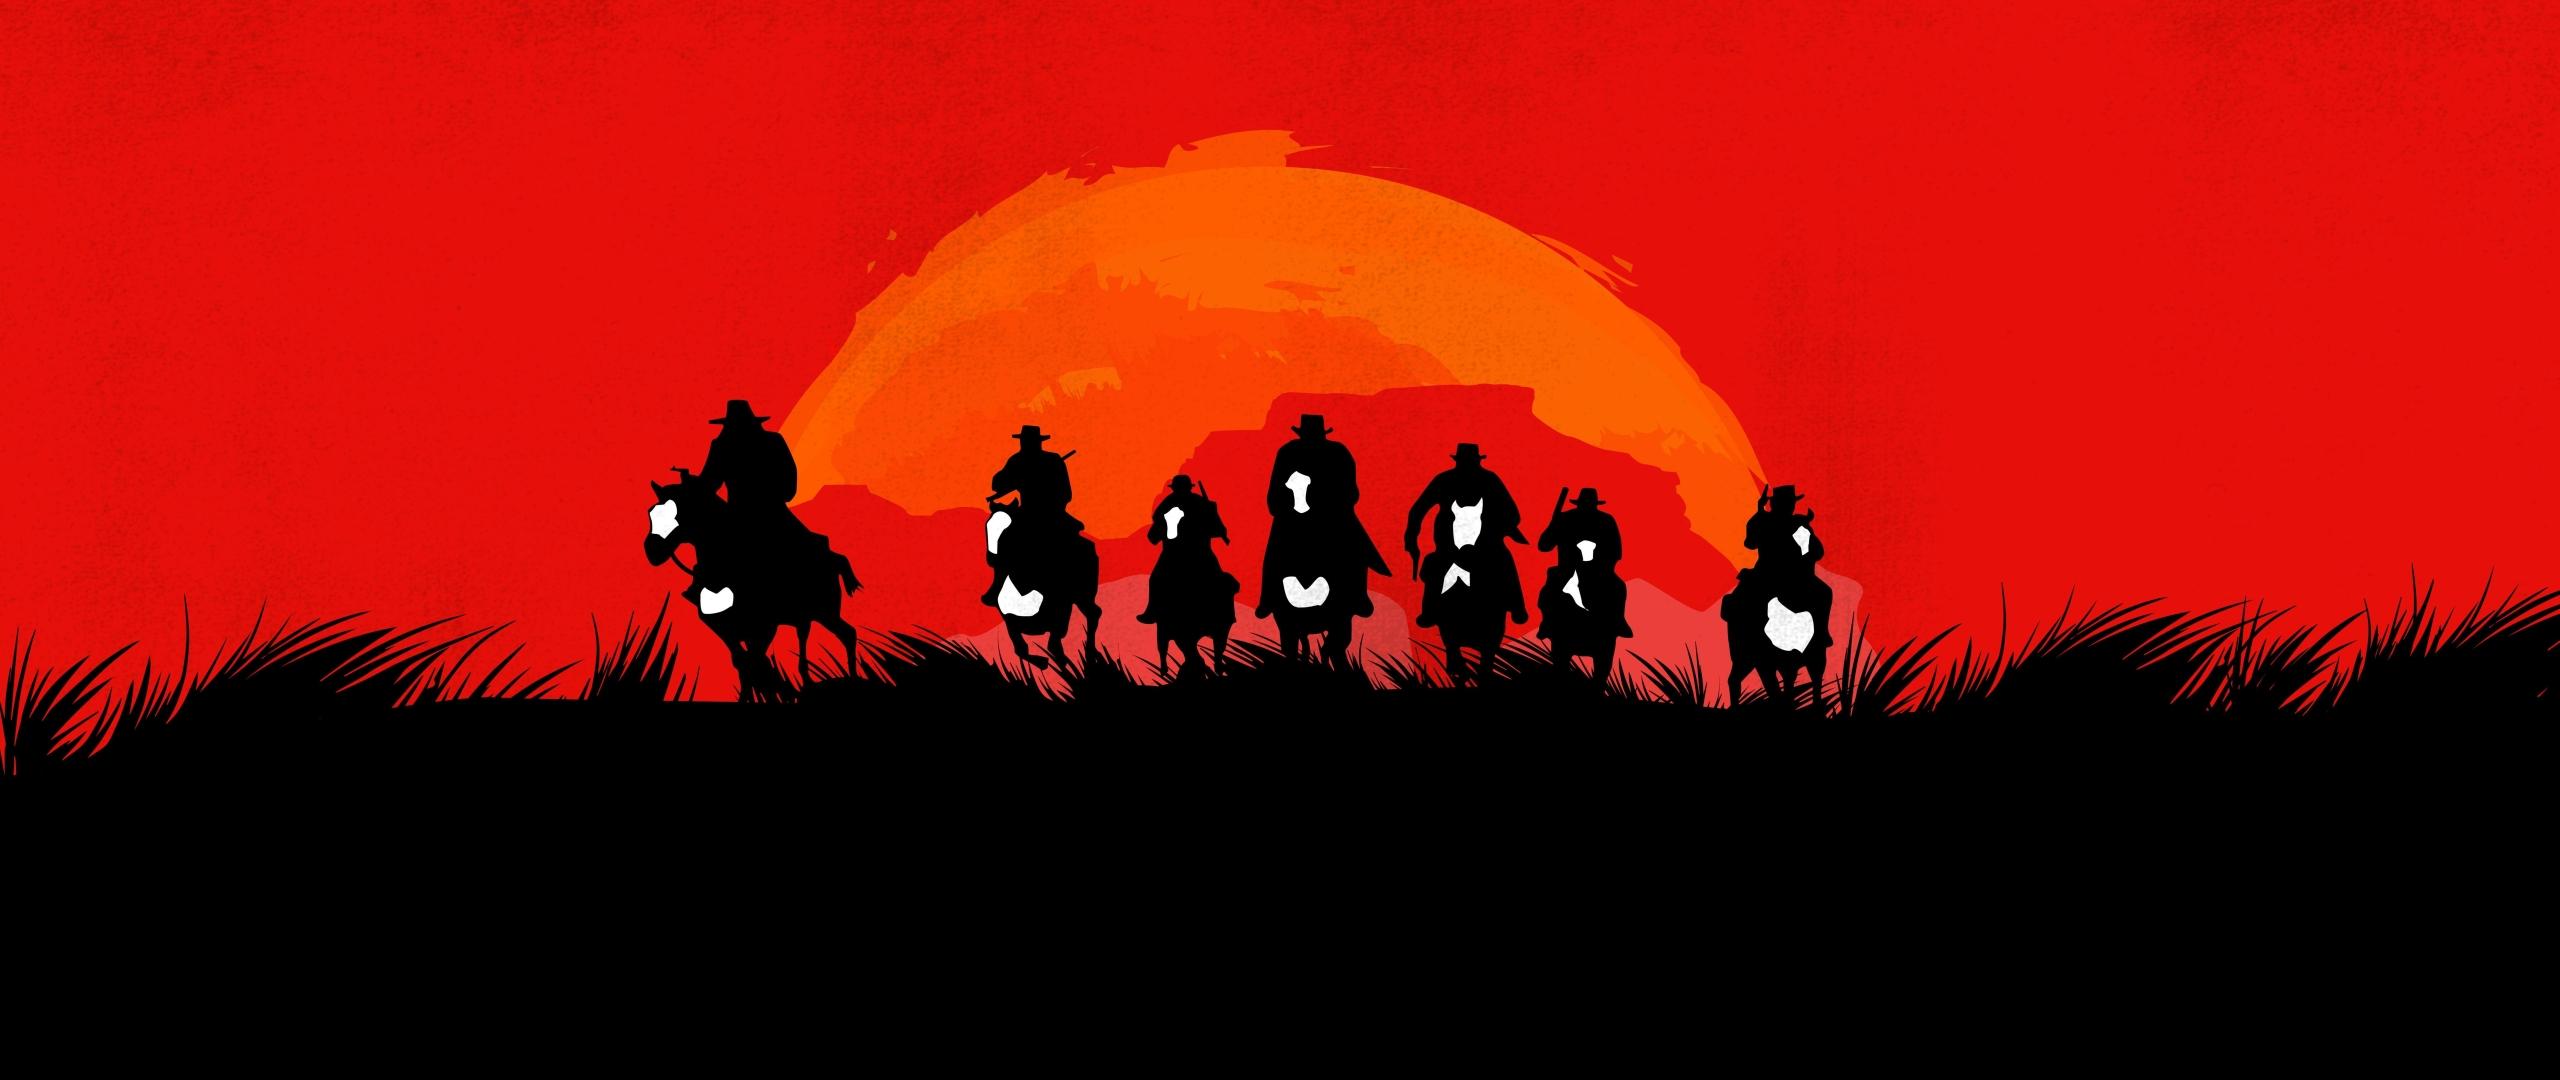 2560x1080 Red Dead Redemption 2 Game 2560x1080 Resolution